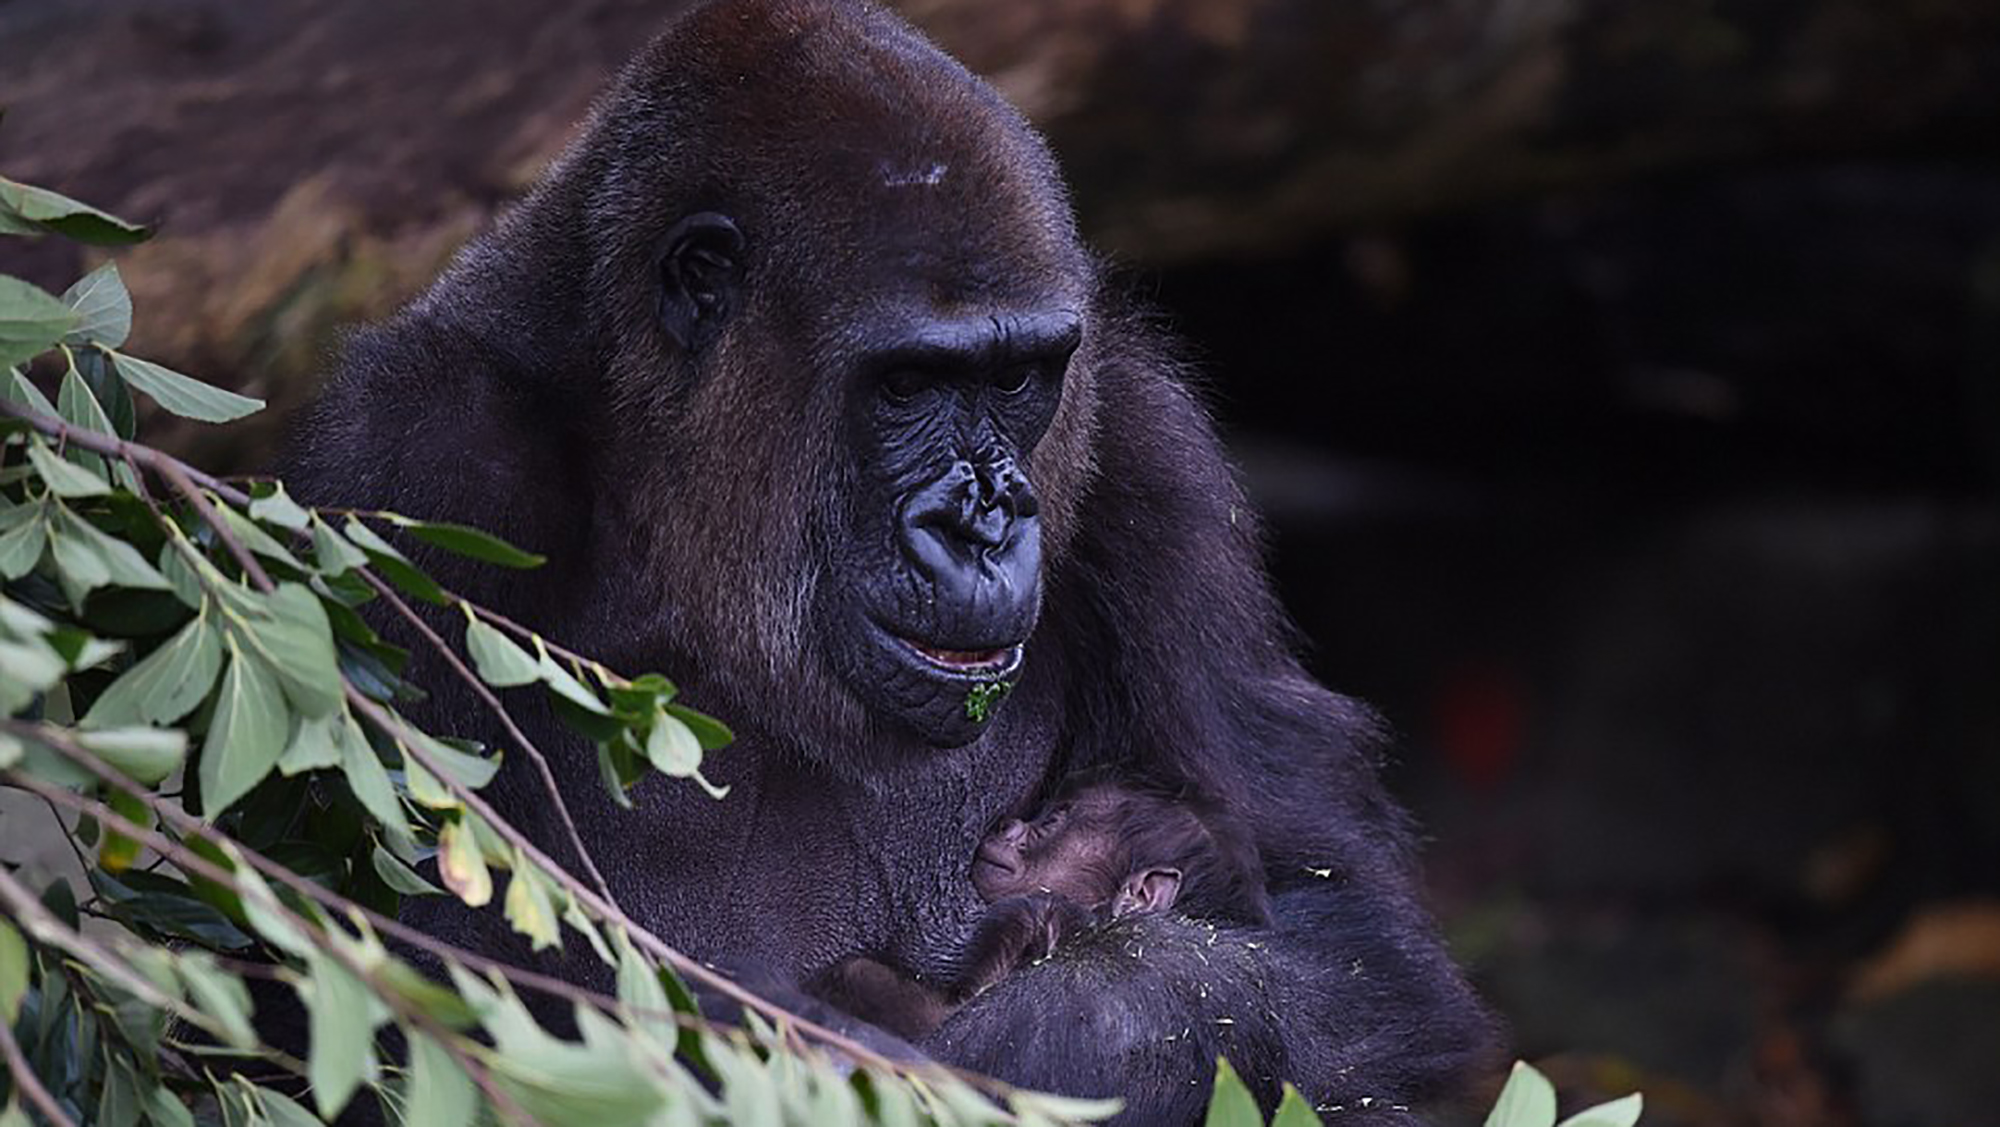 Meet the new baby gorilla born at Taronga Zoo this week